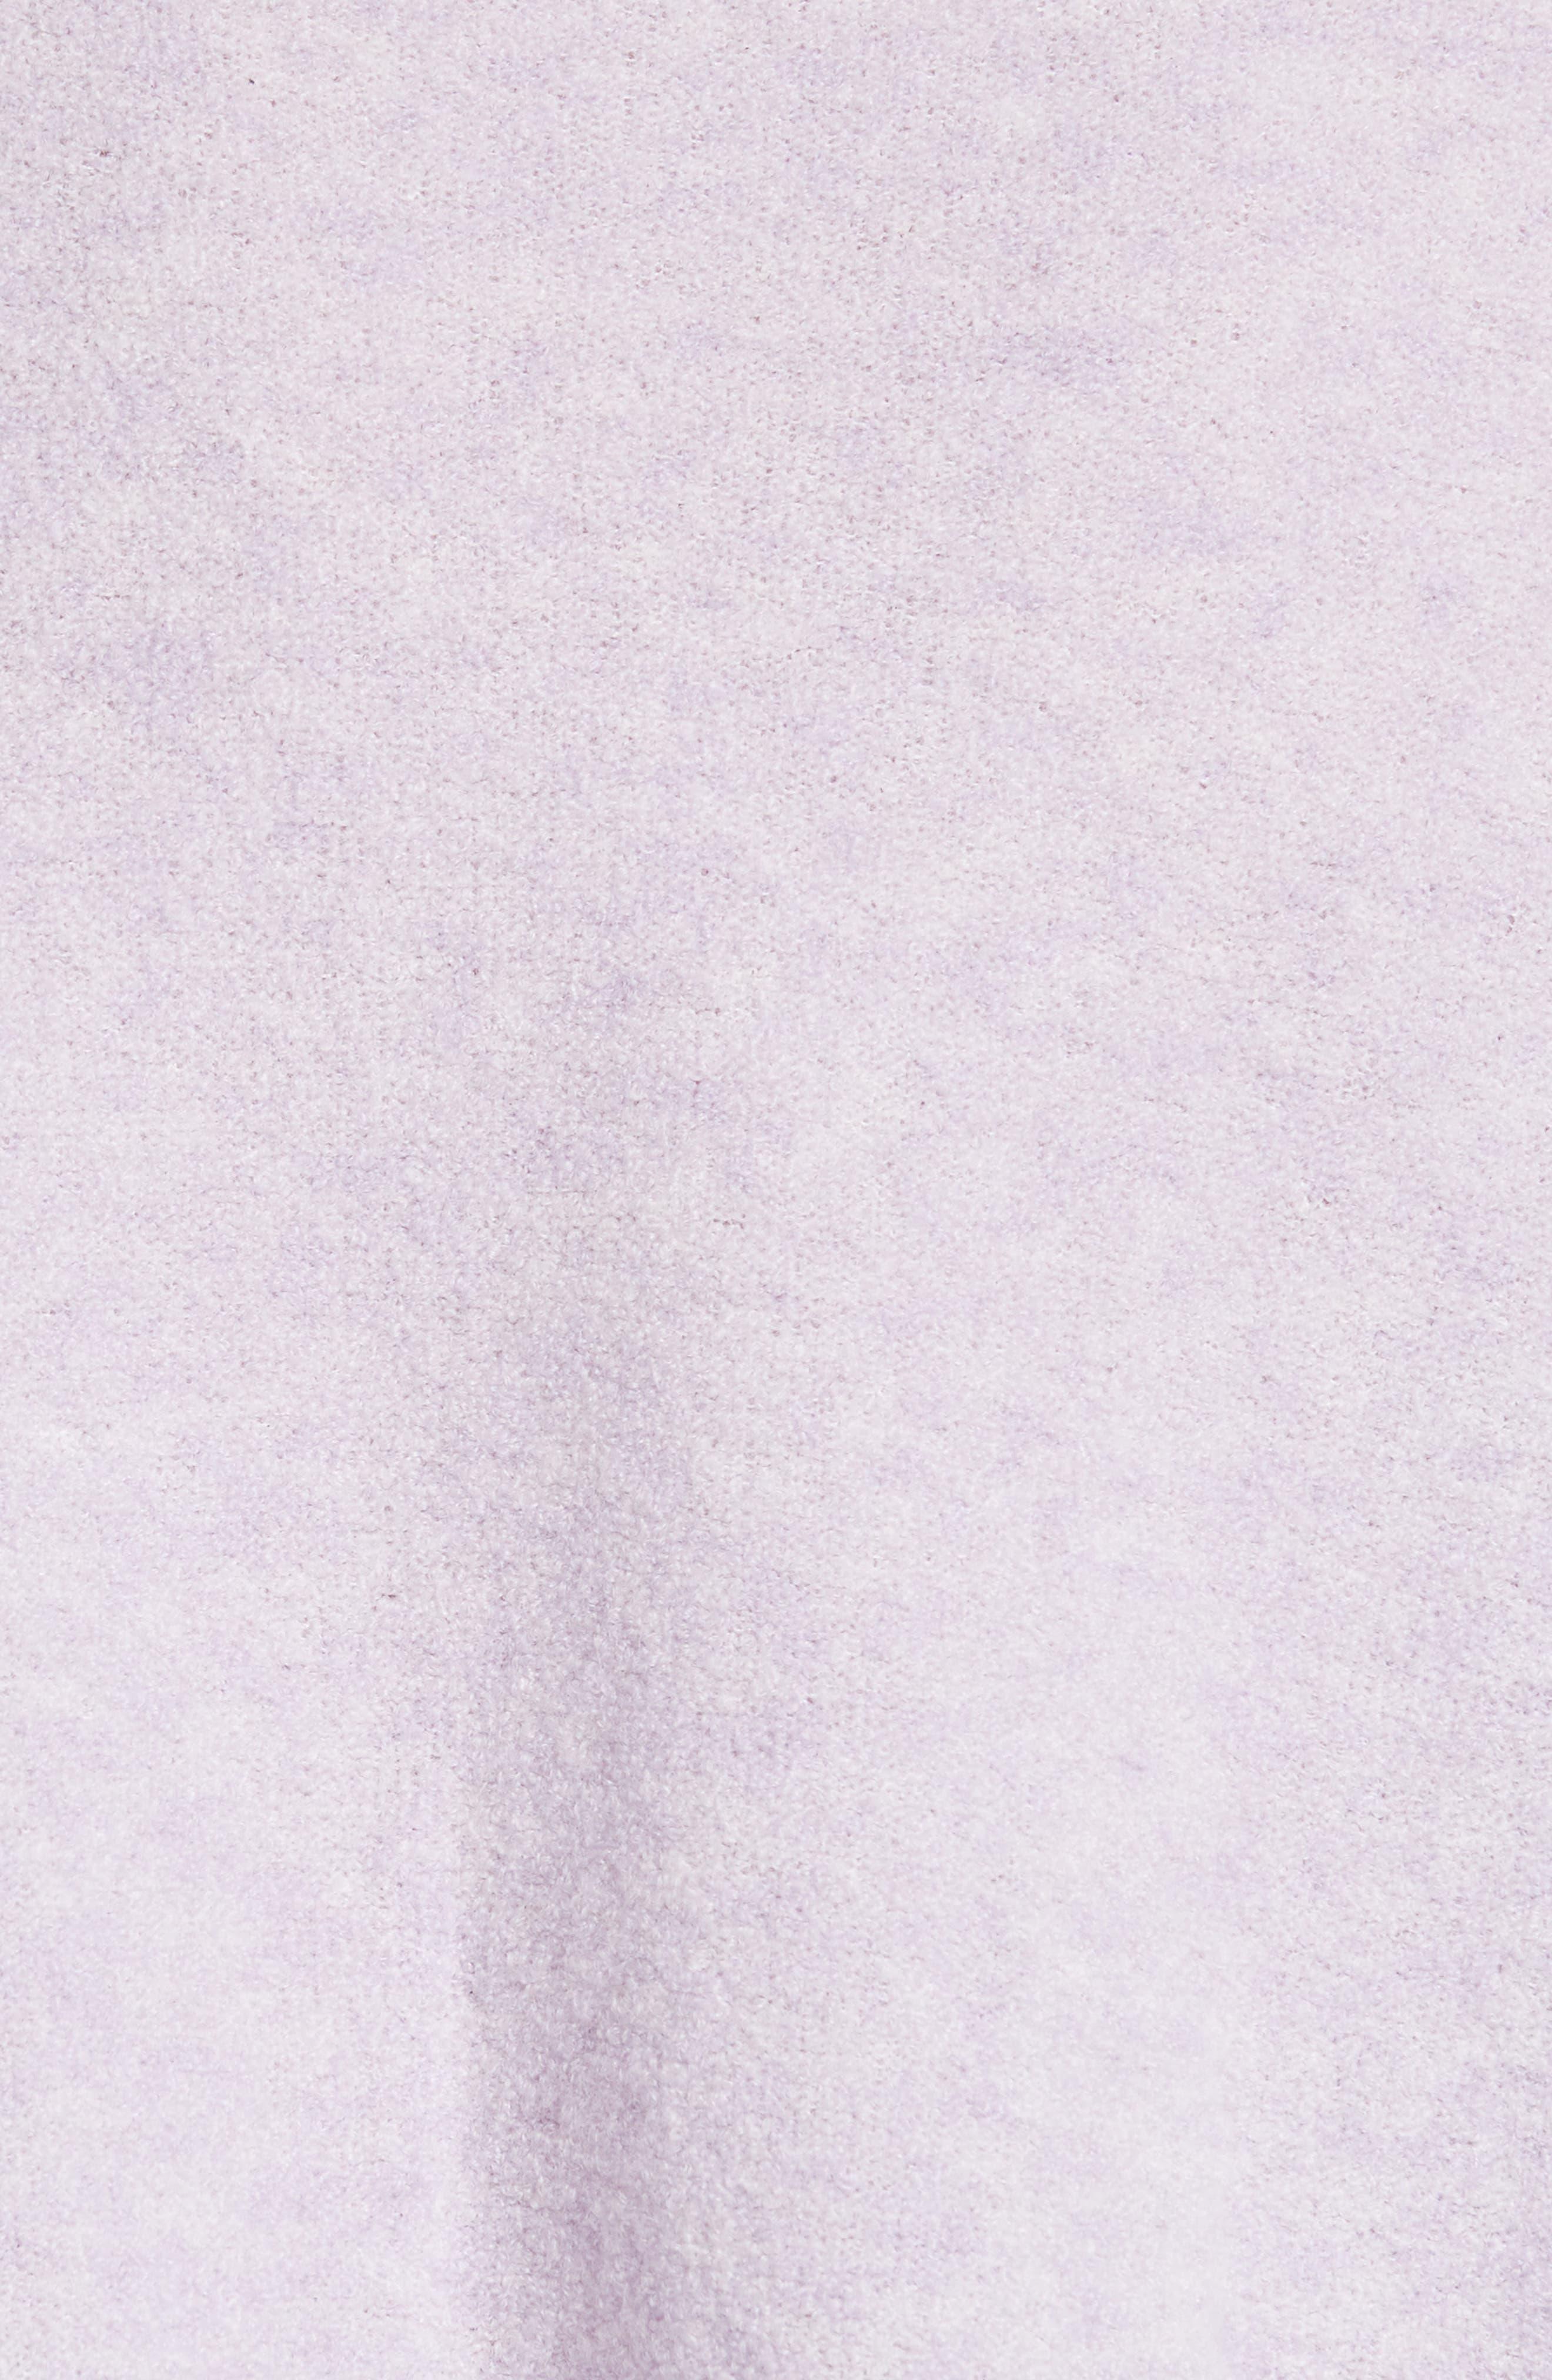 Cashmere Blend Bouclé Sweater,                             Alternate thumbnail 5, color,                             PURPLE HEIRLOOM HEATHER